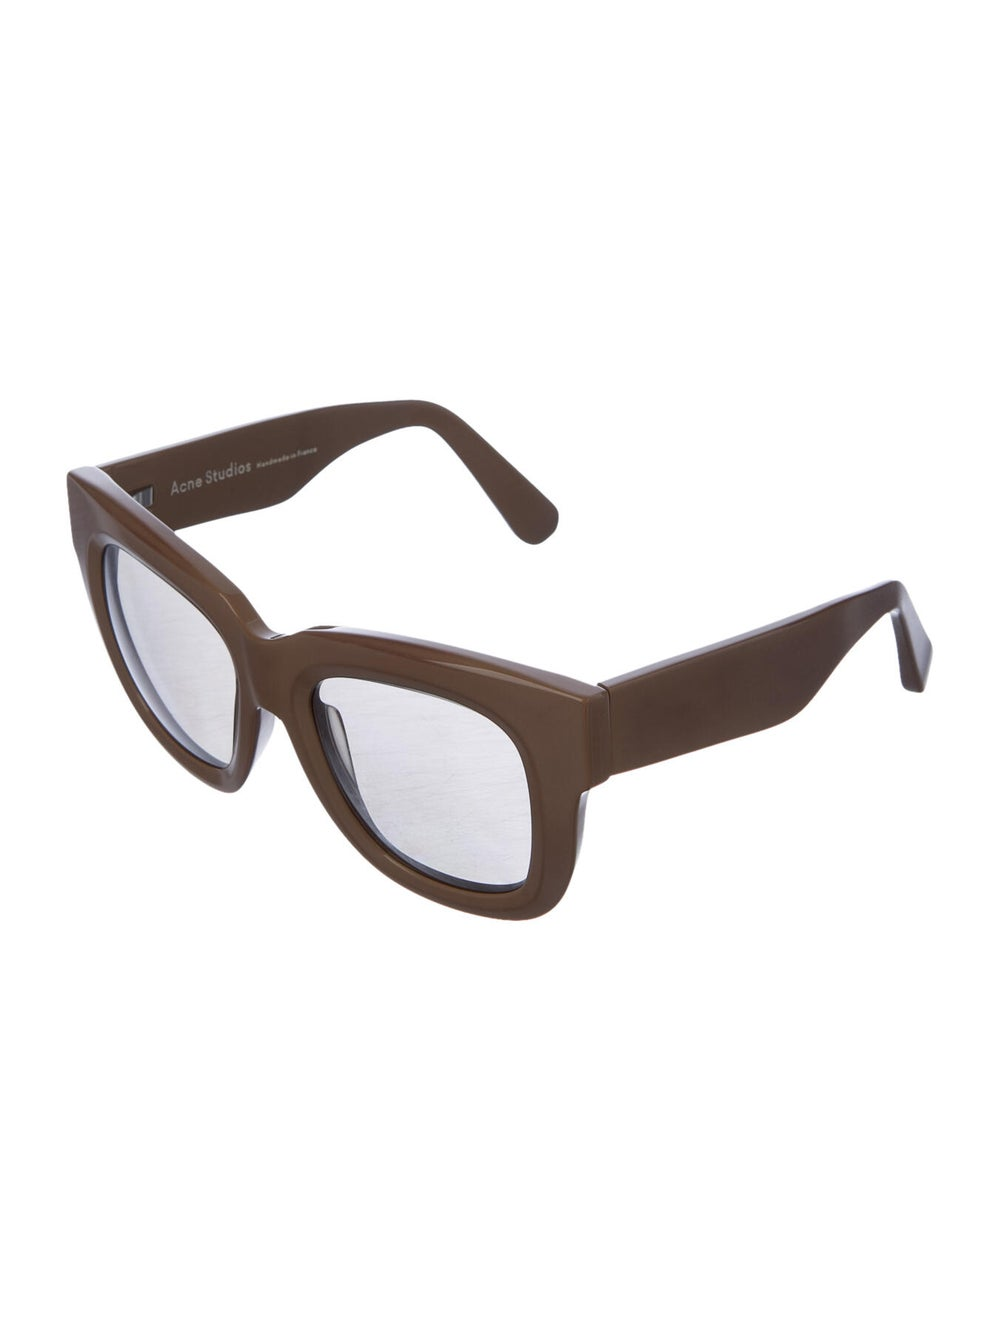 Acne Studios Square Mirrored Sunglasses - image 2